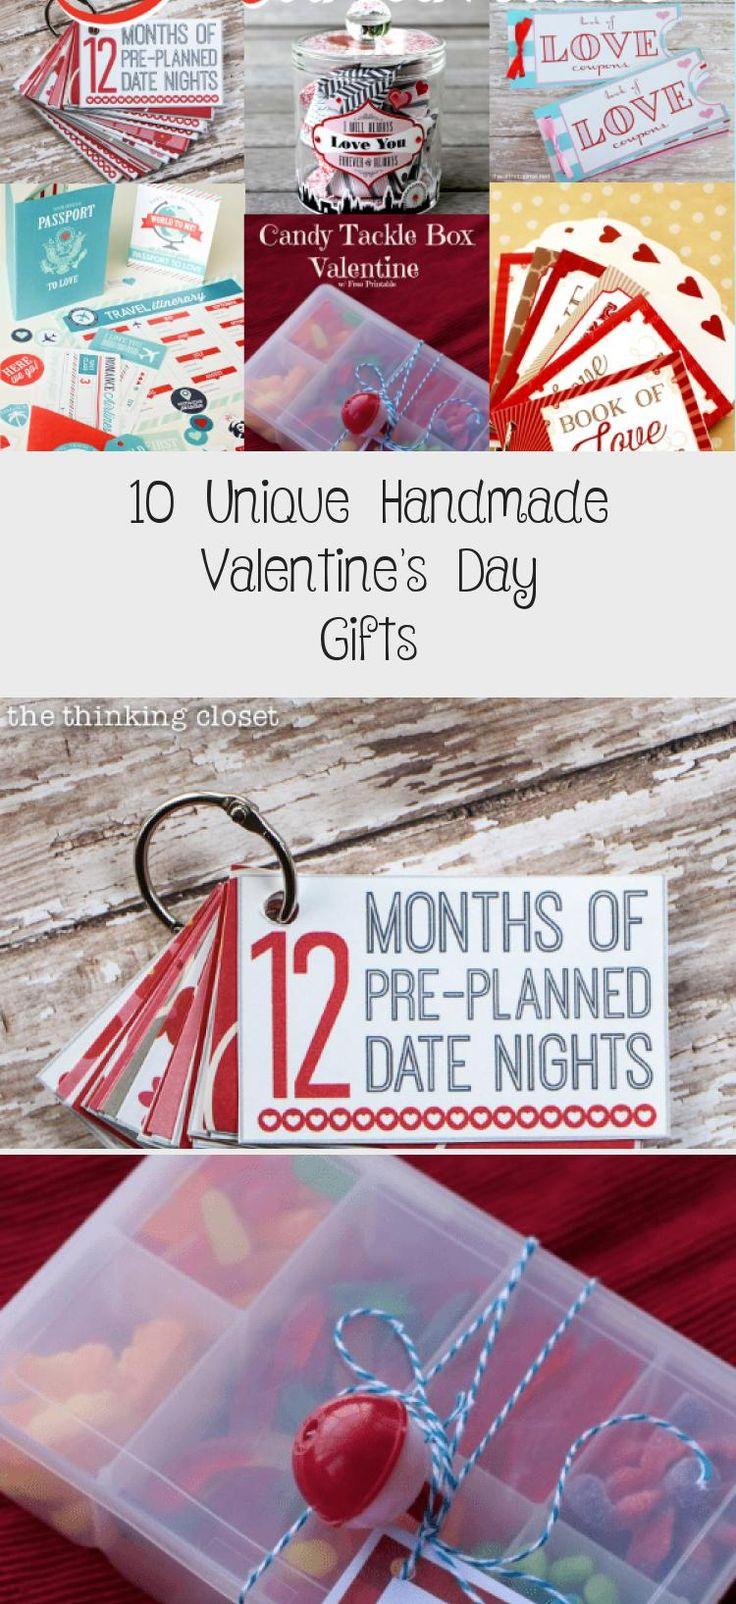 10 unique handmade valentines day gifts handmade